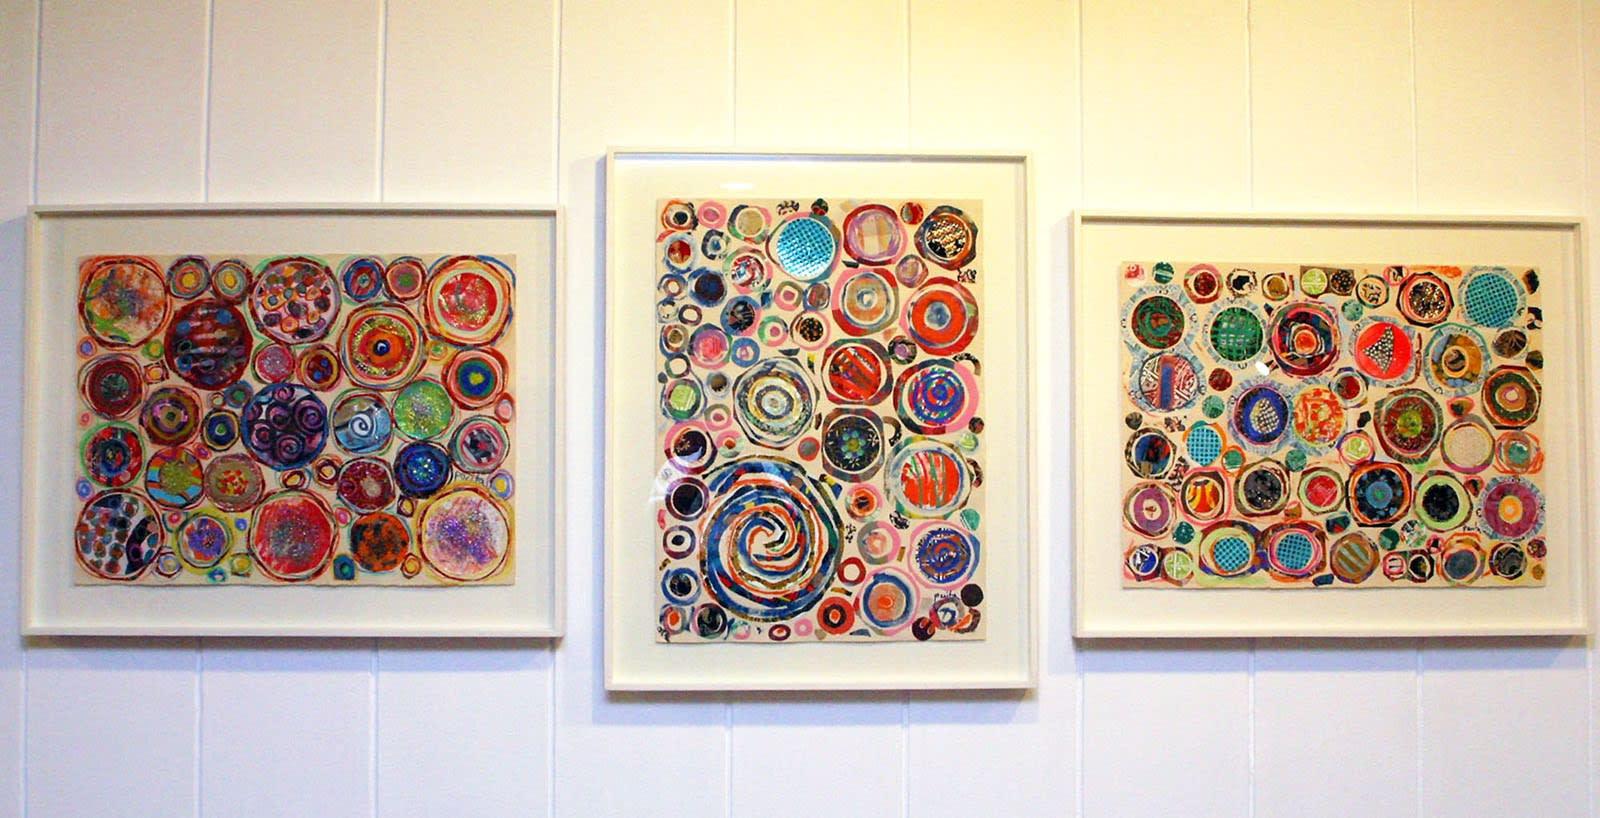 Pacita Abad: Circles in My Mind